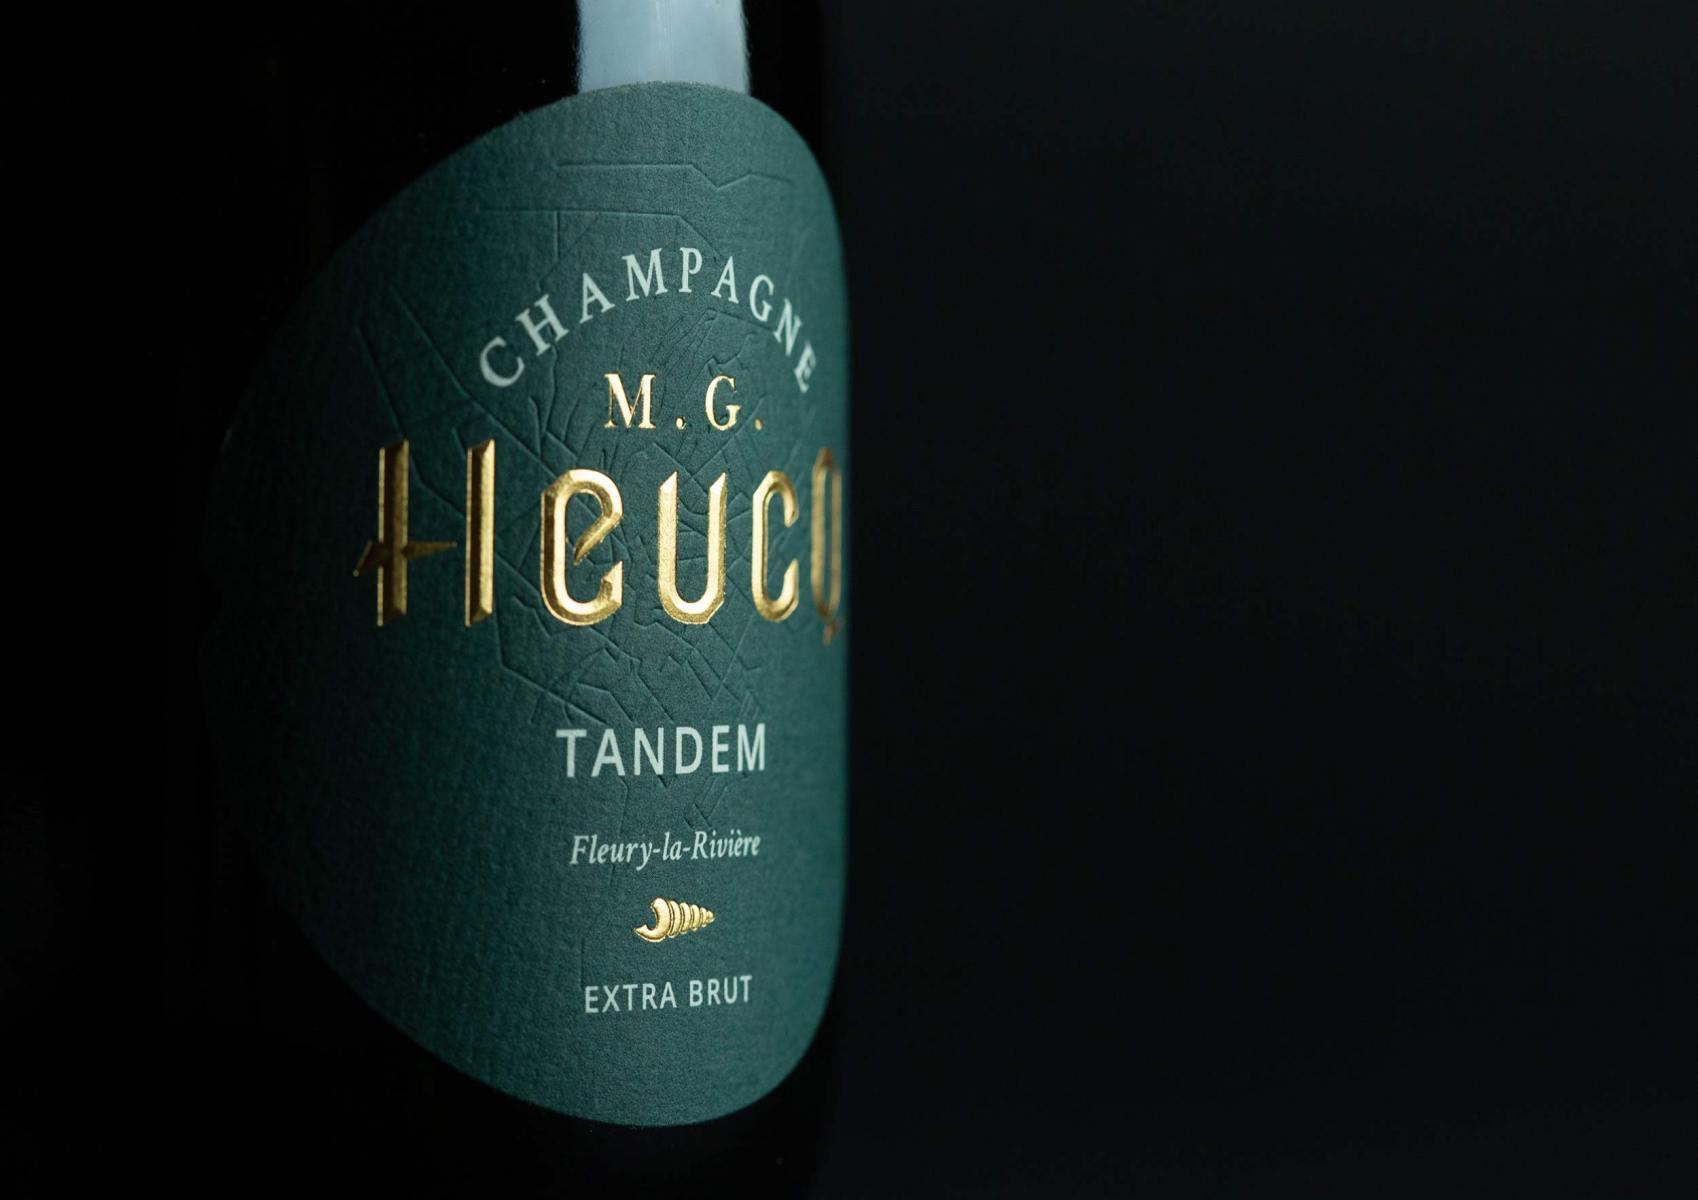 Champagne-MG-HEUCQ-Tandem-BD